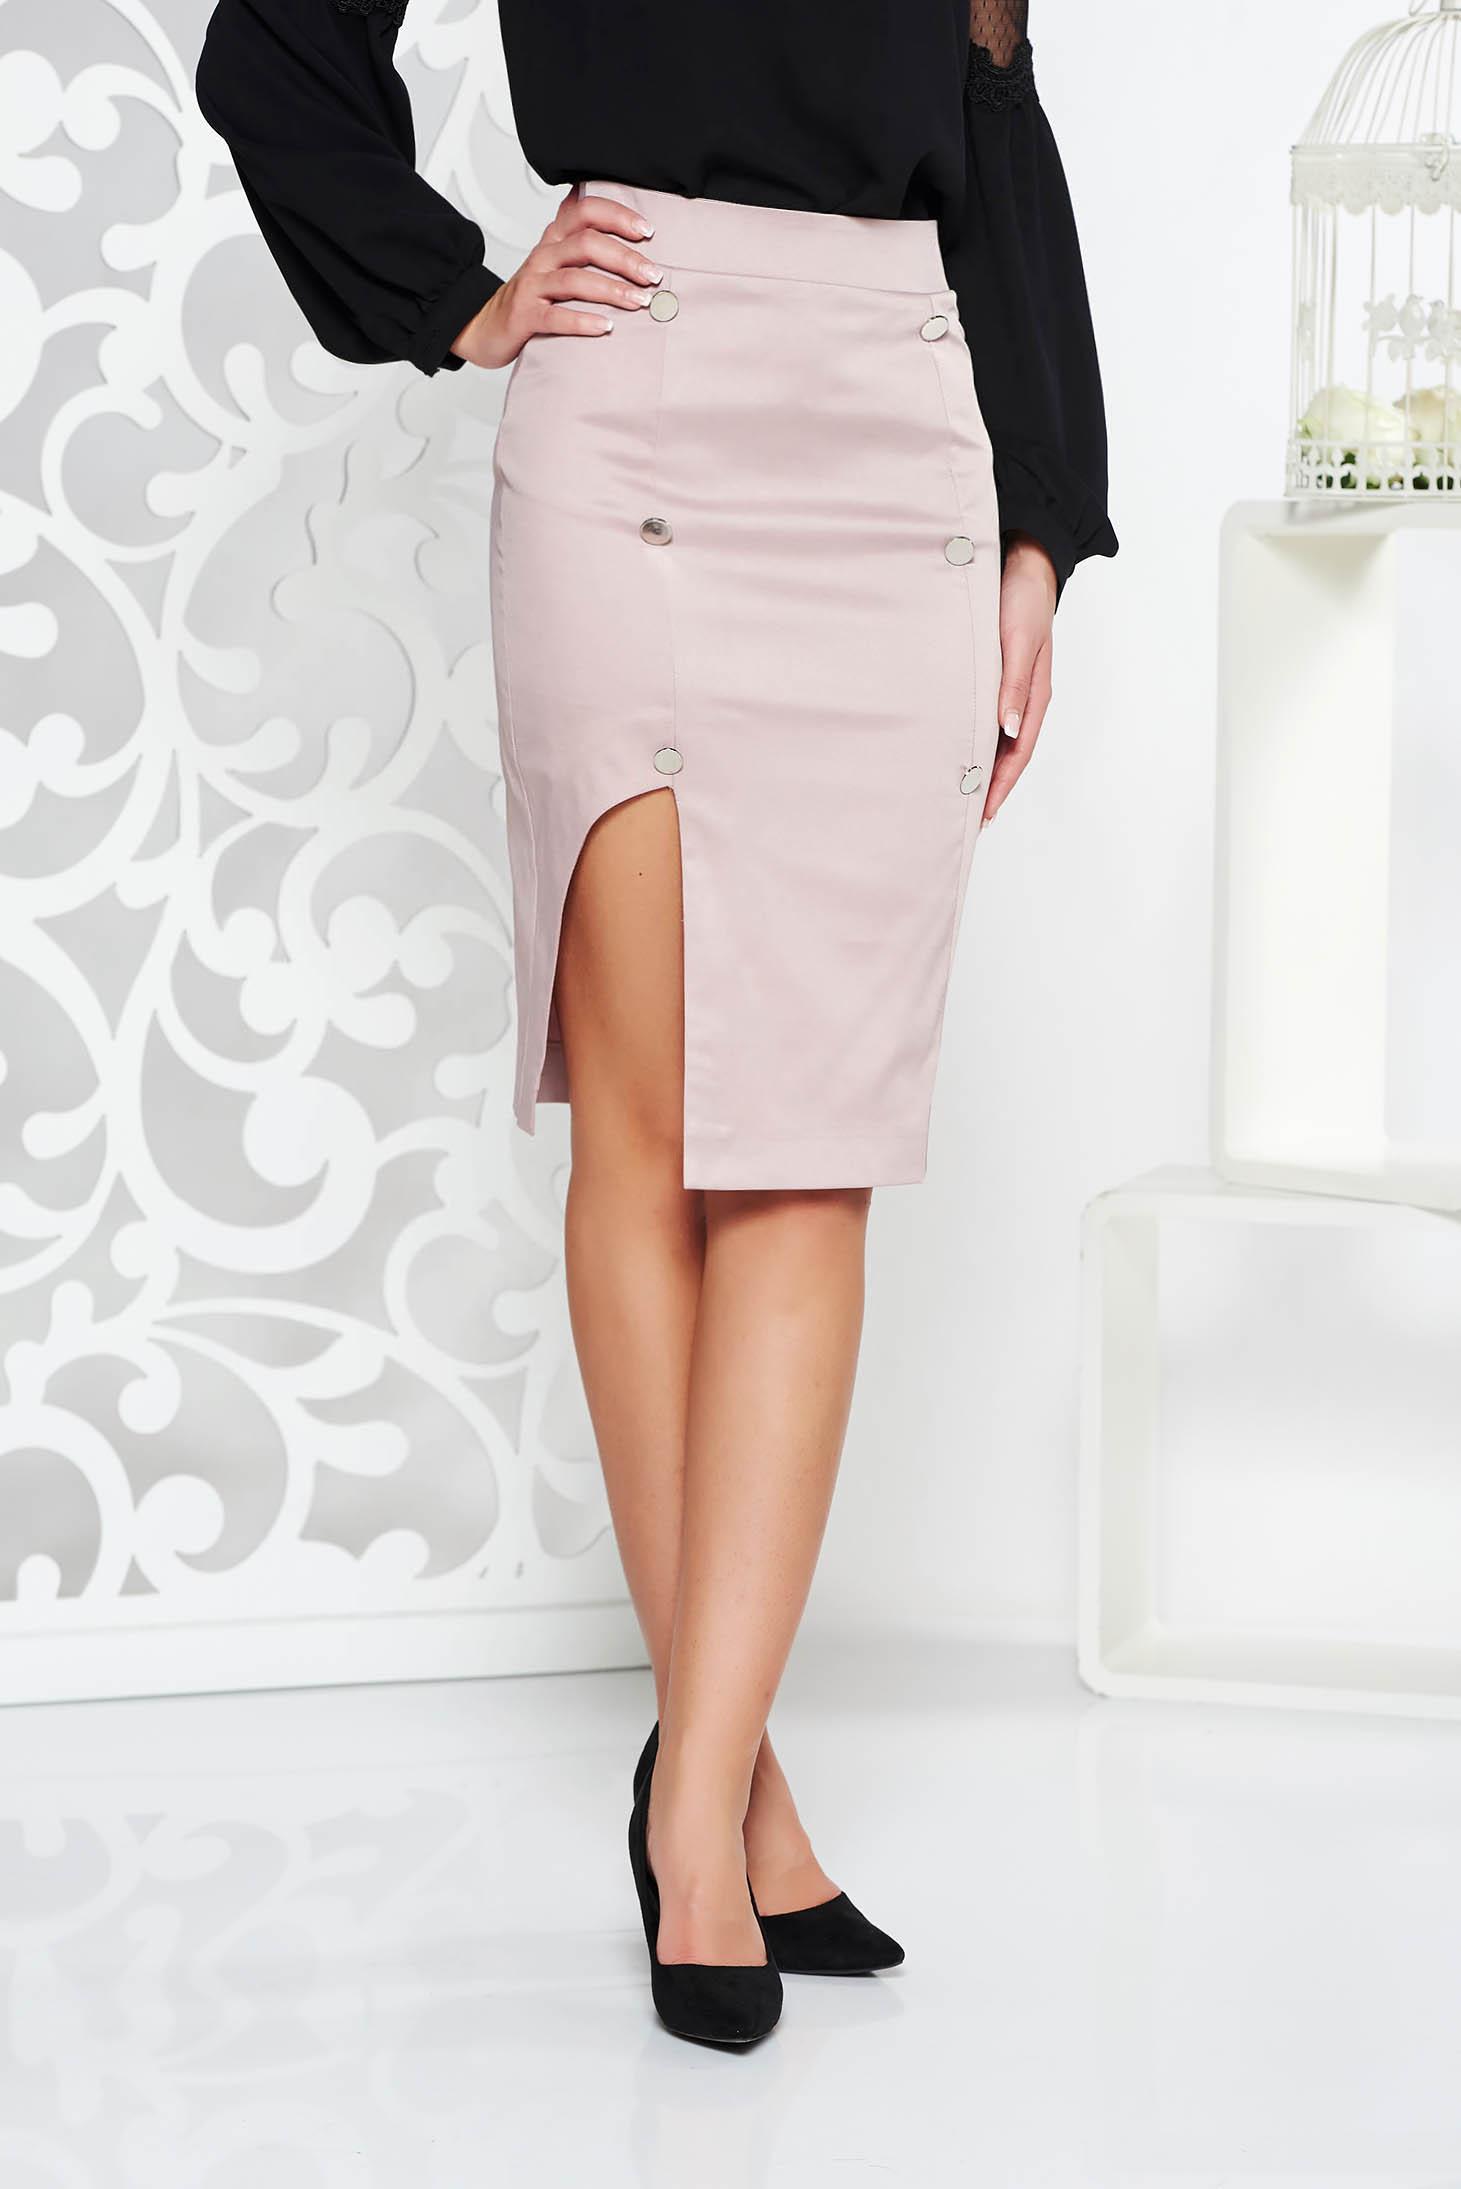 PrettyGirl lila skirt office with inside lining pencil high waisted